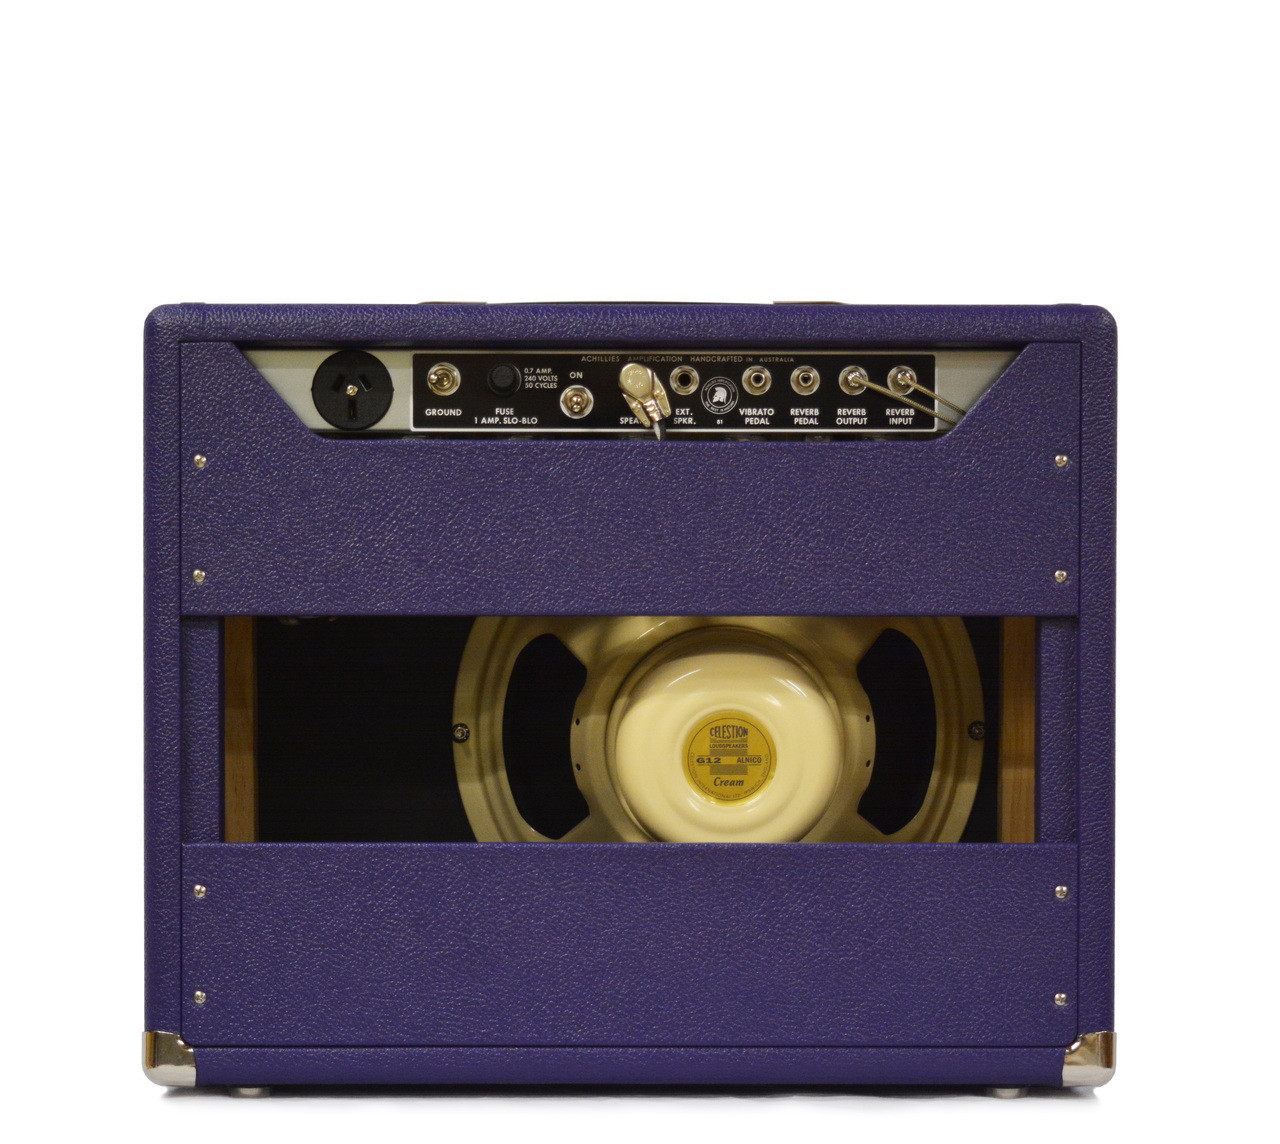 "Zephyr 15 Celestion Alnico Cream 12"" Speaker Purple Bronco Tolex"